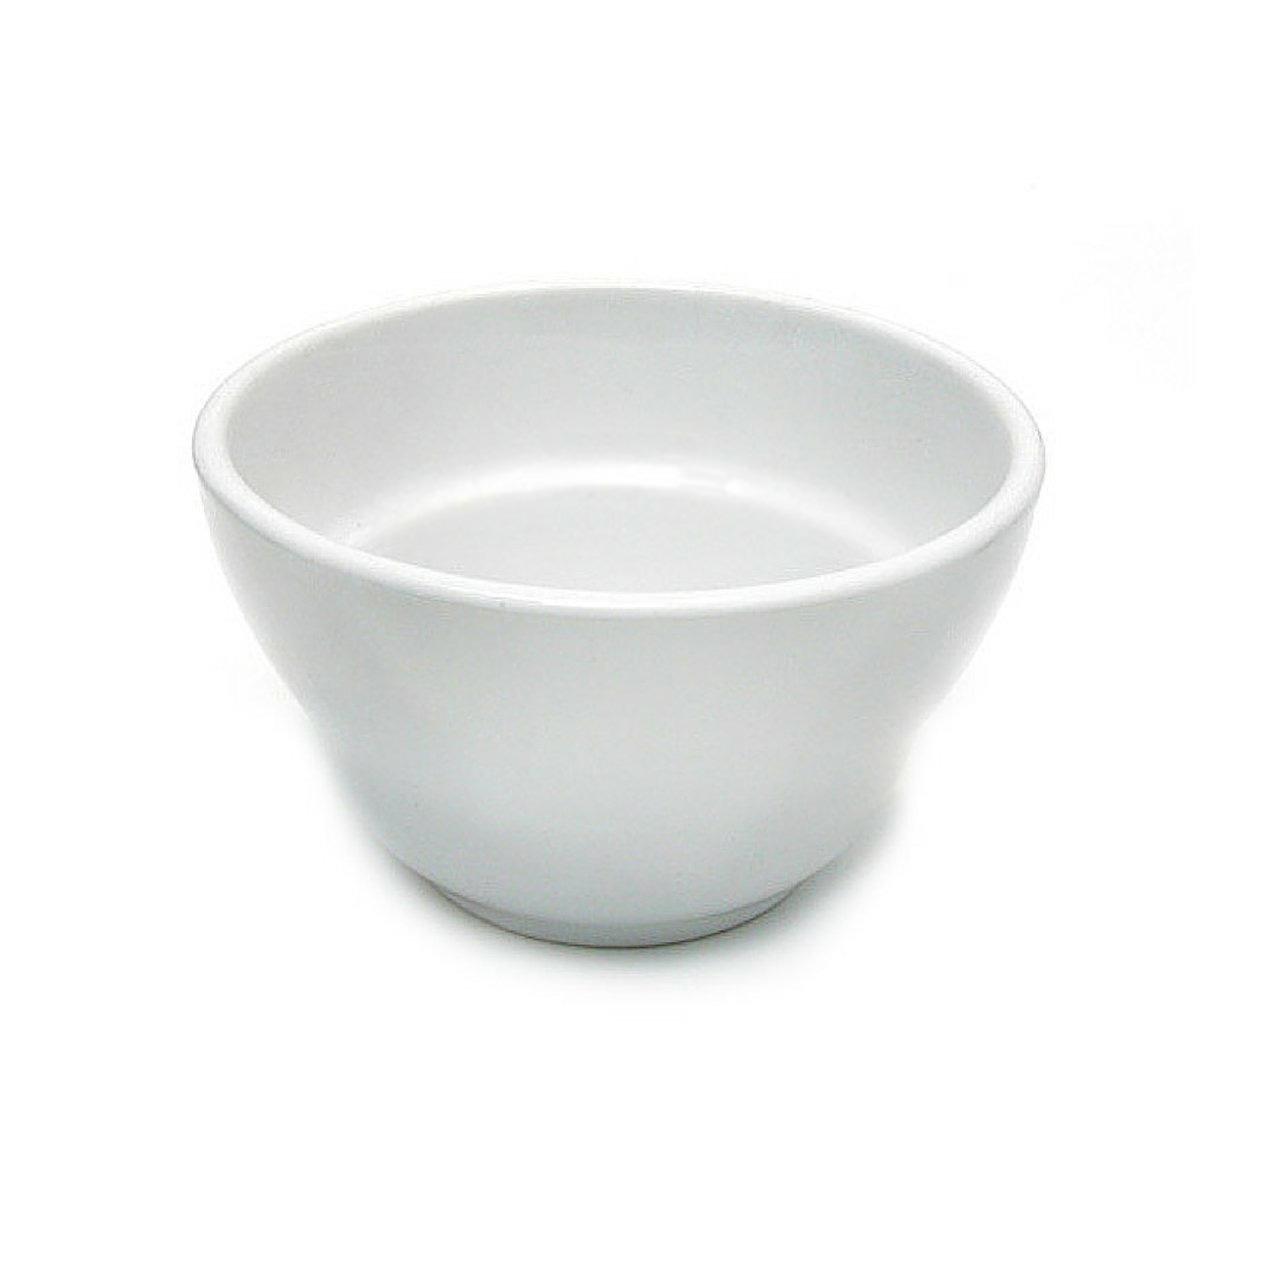 Ceramic Cupping Bowl 7.5 oz - World Ceramic